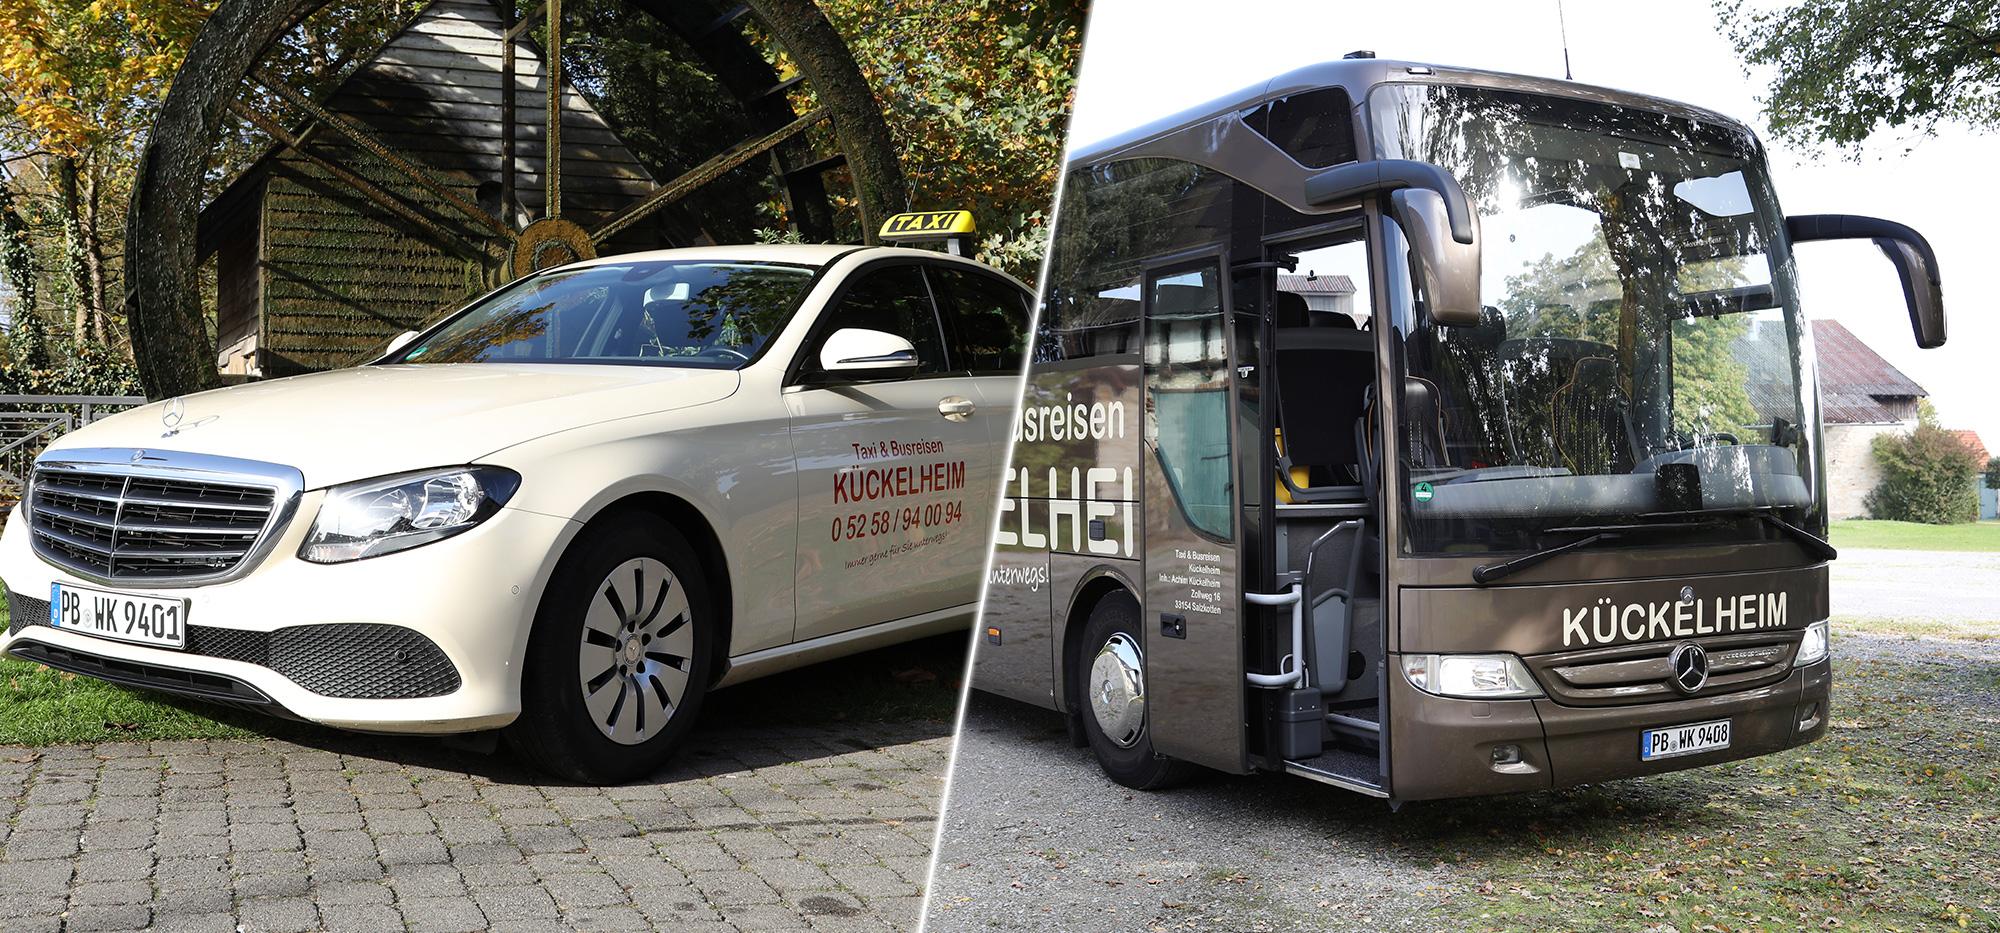 Taxi & Busreisen Kückelheim